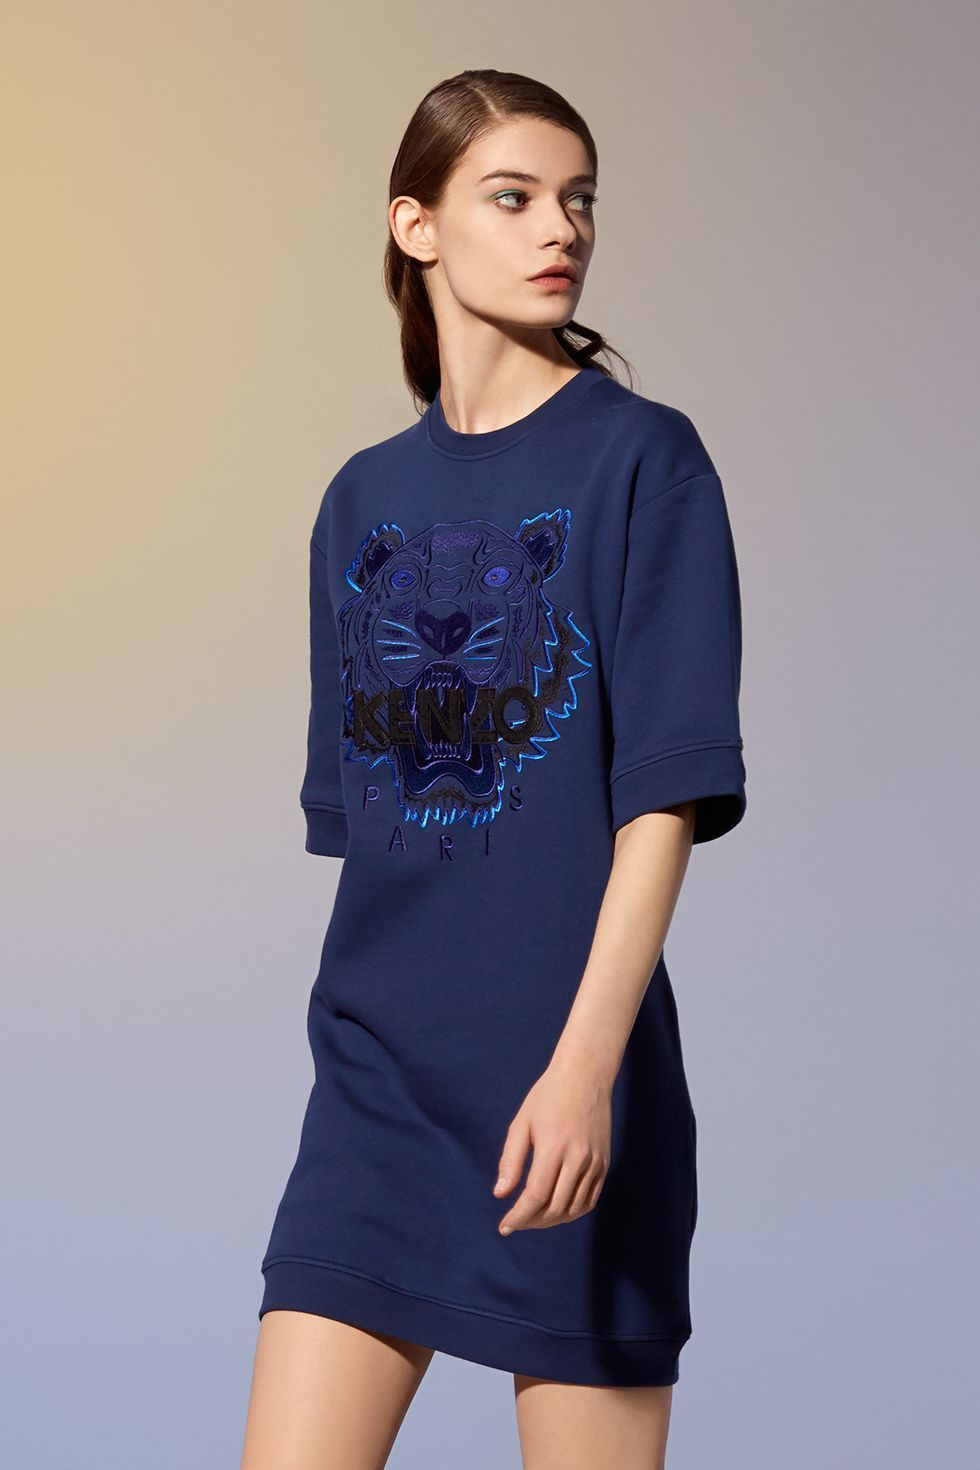 Robe Tiger manches courtes Kenzo - Robes Kenzo Femme - E-Shop Kenzo ... f8c9375a0a24